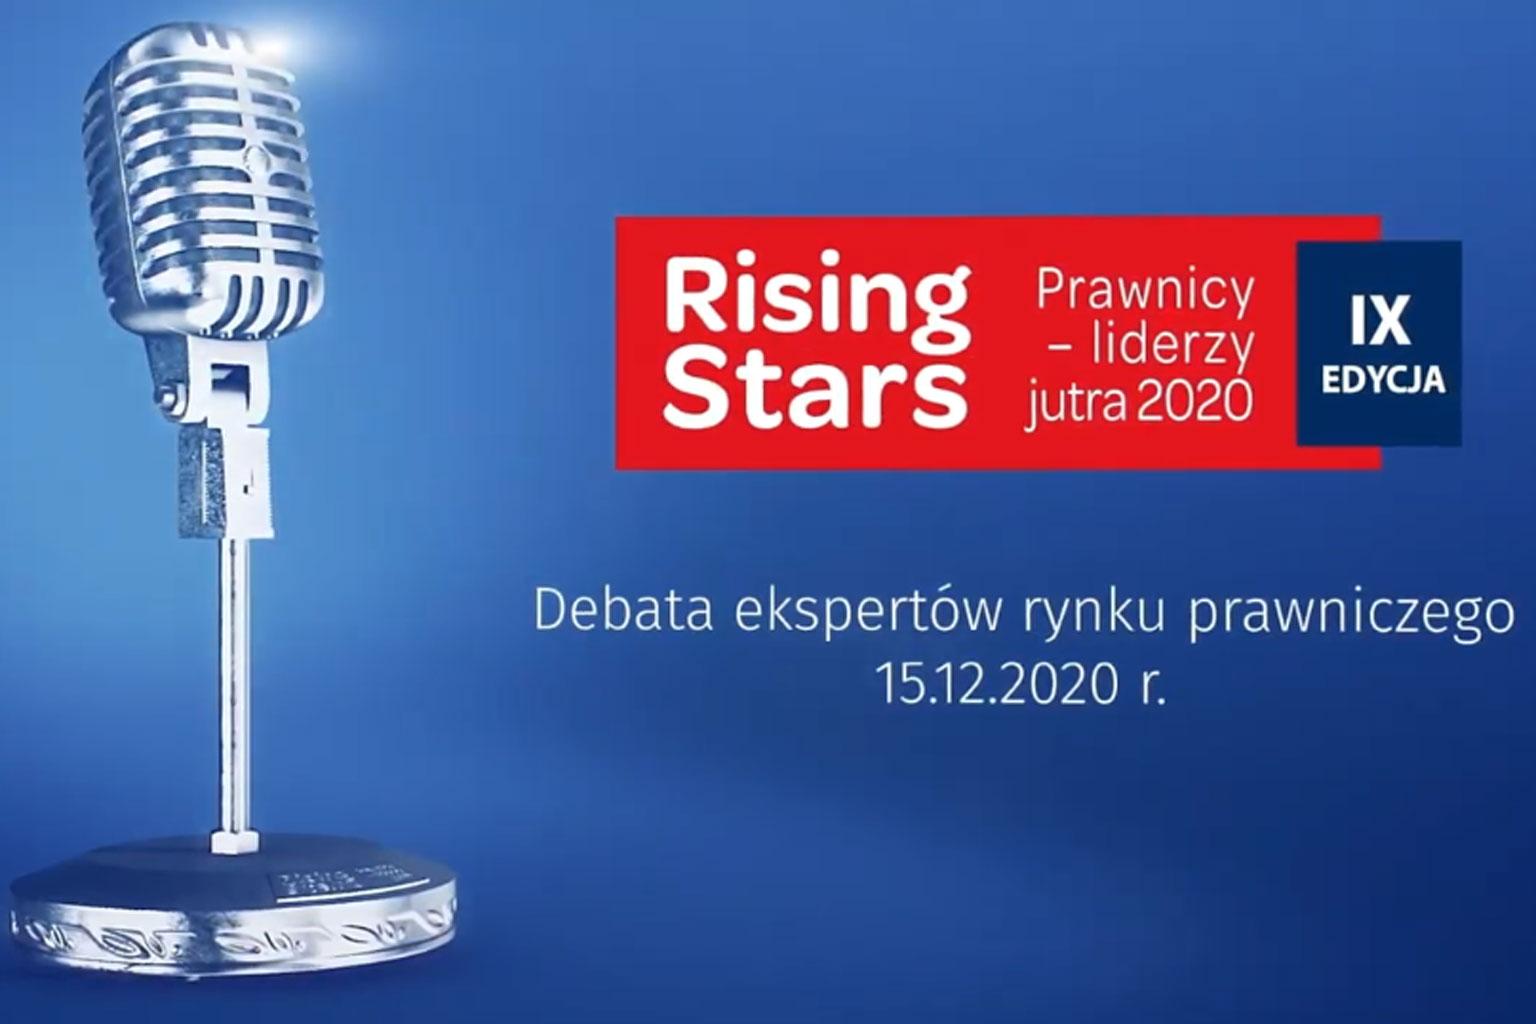 Debata - Rising Stars Prawnicy – liderzy jutra